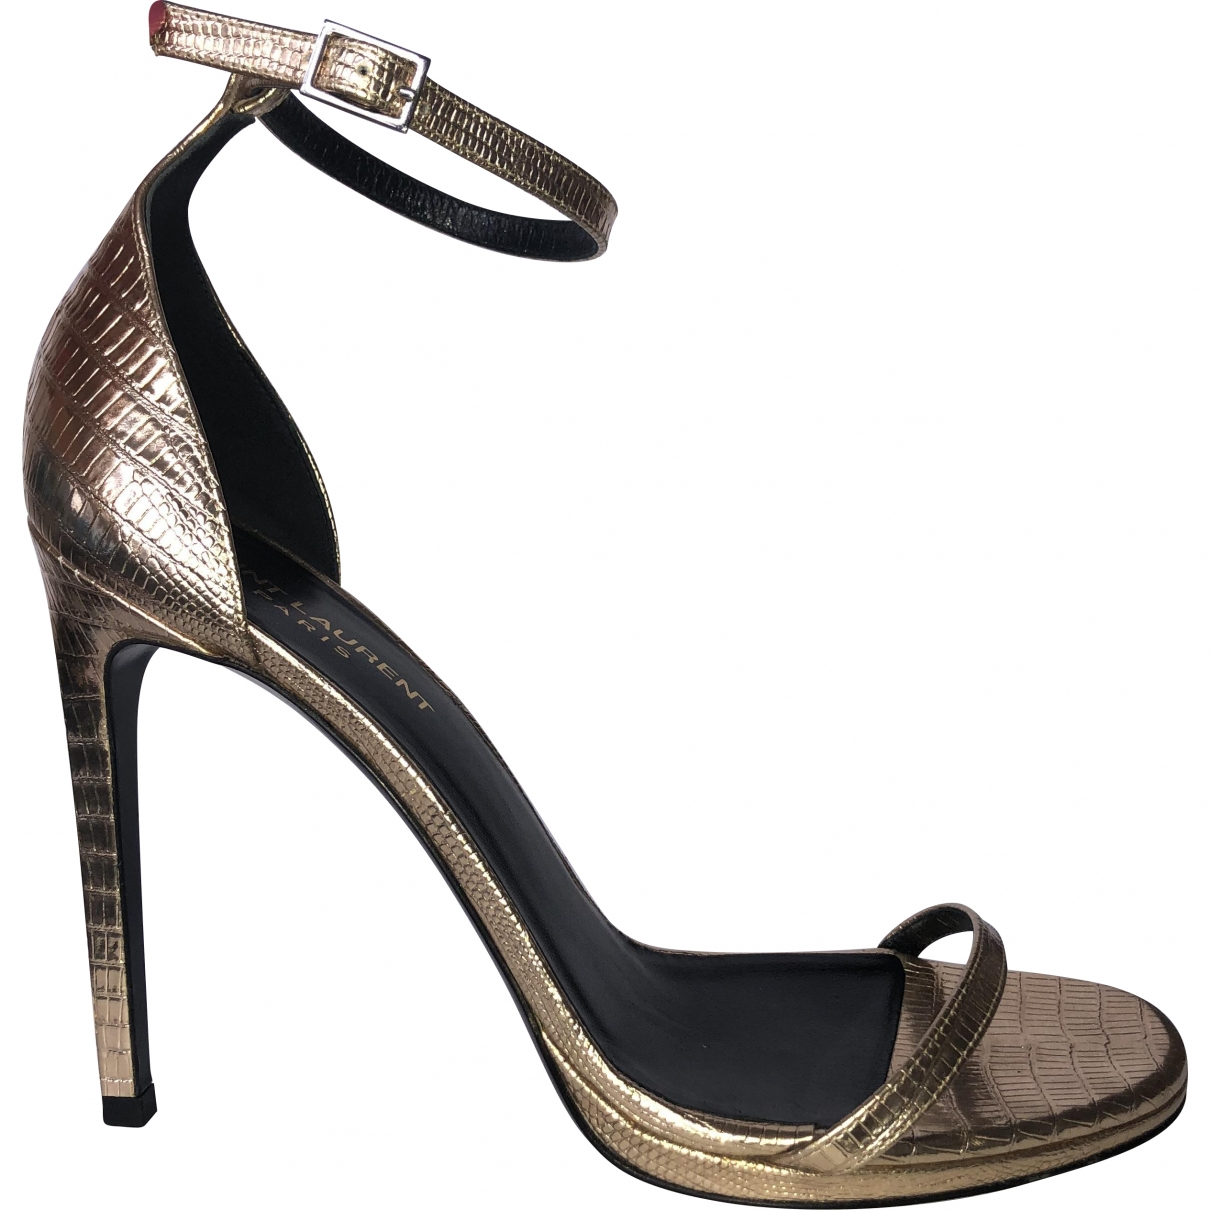 Saint Laurent \N Gold Leather Sandals for Women 39 EU